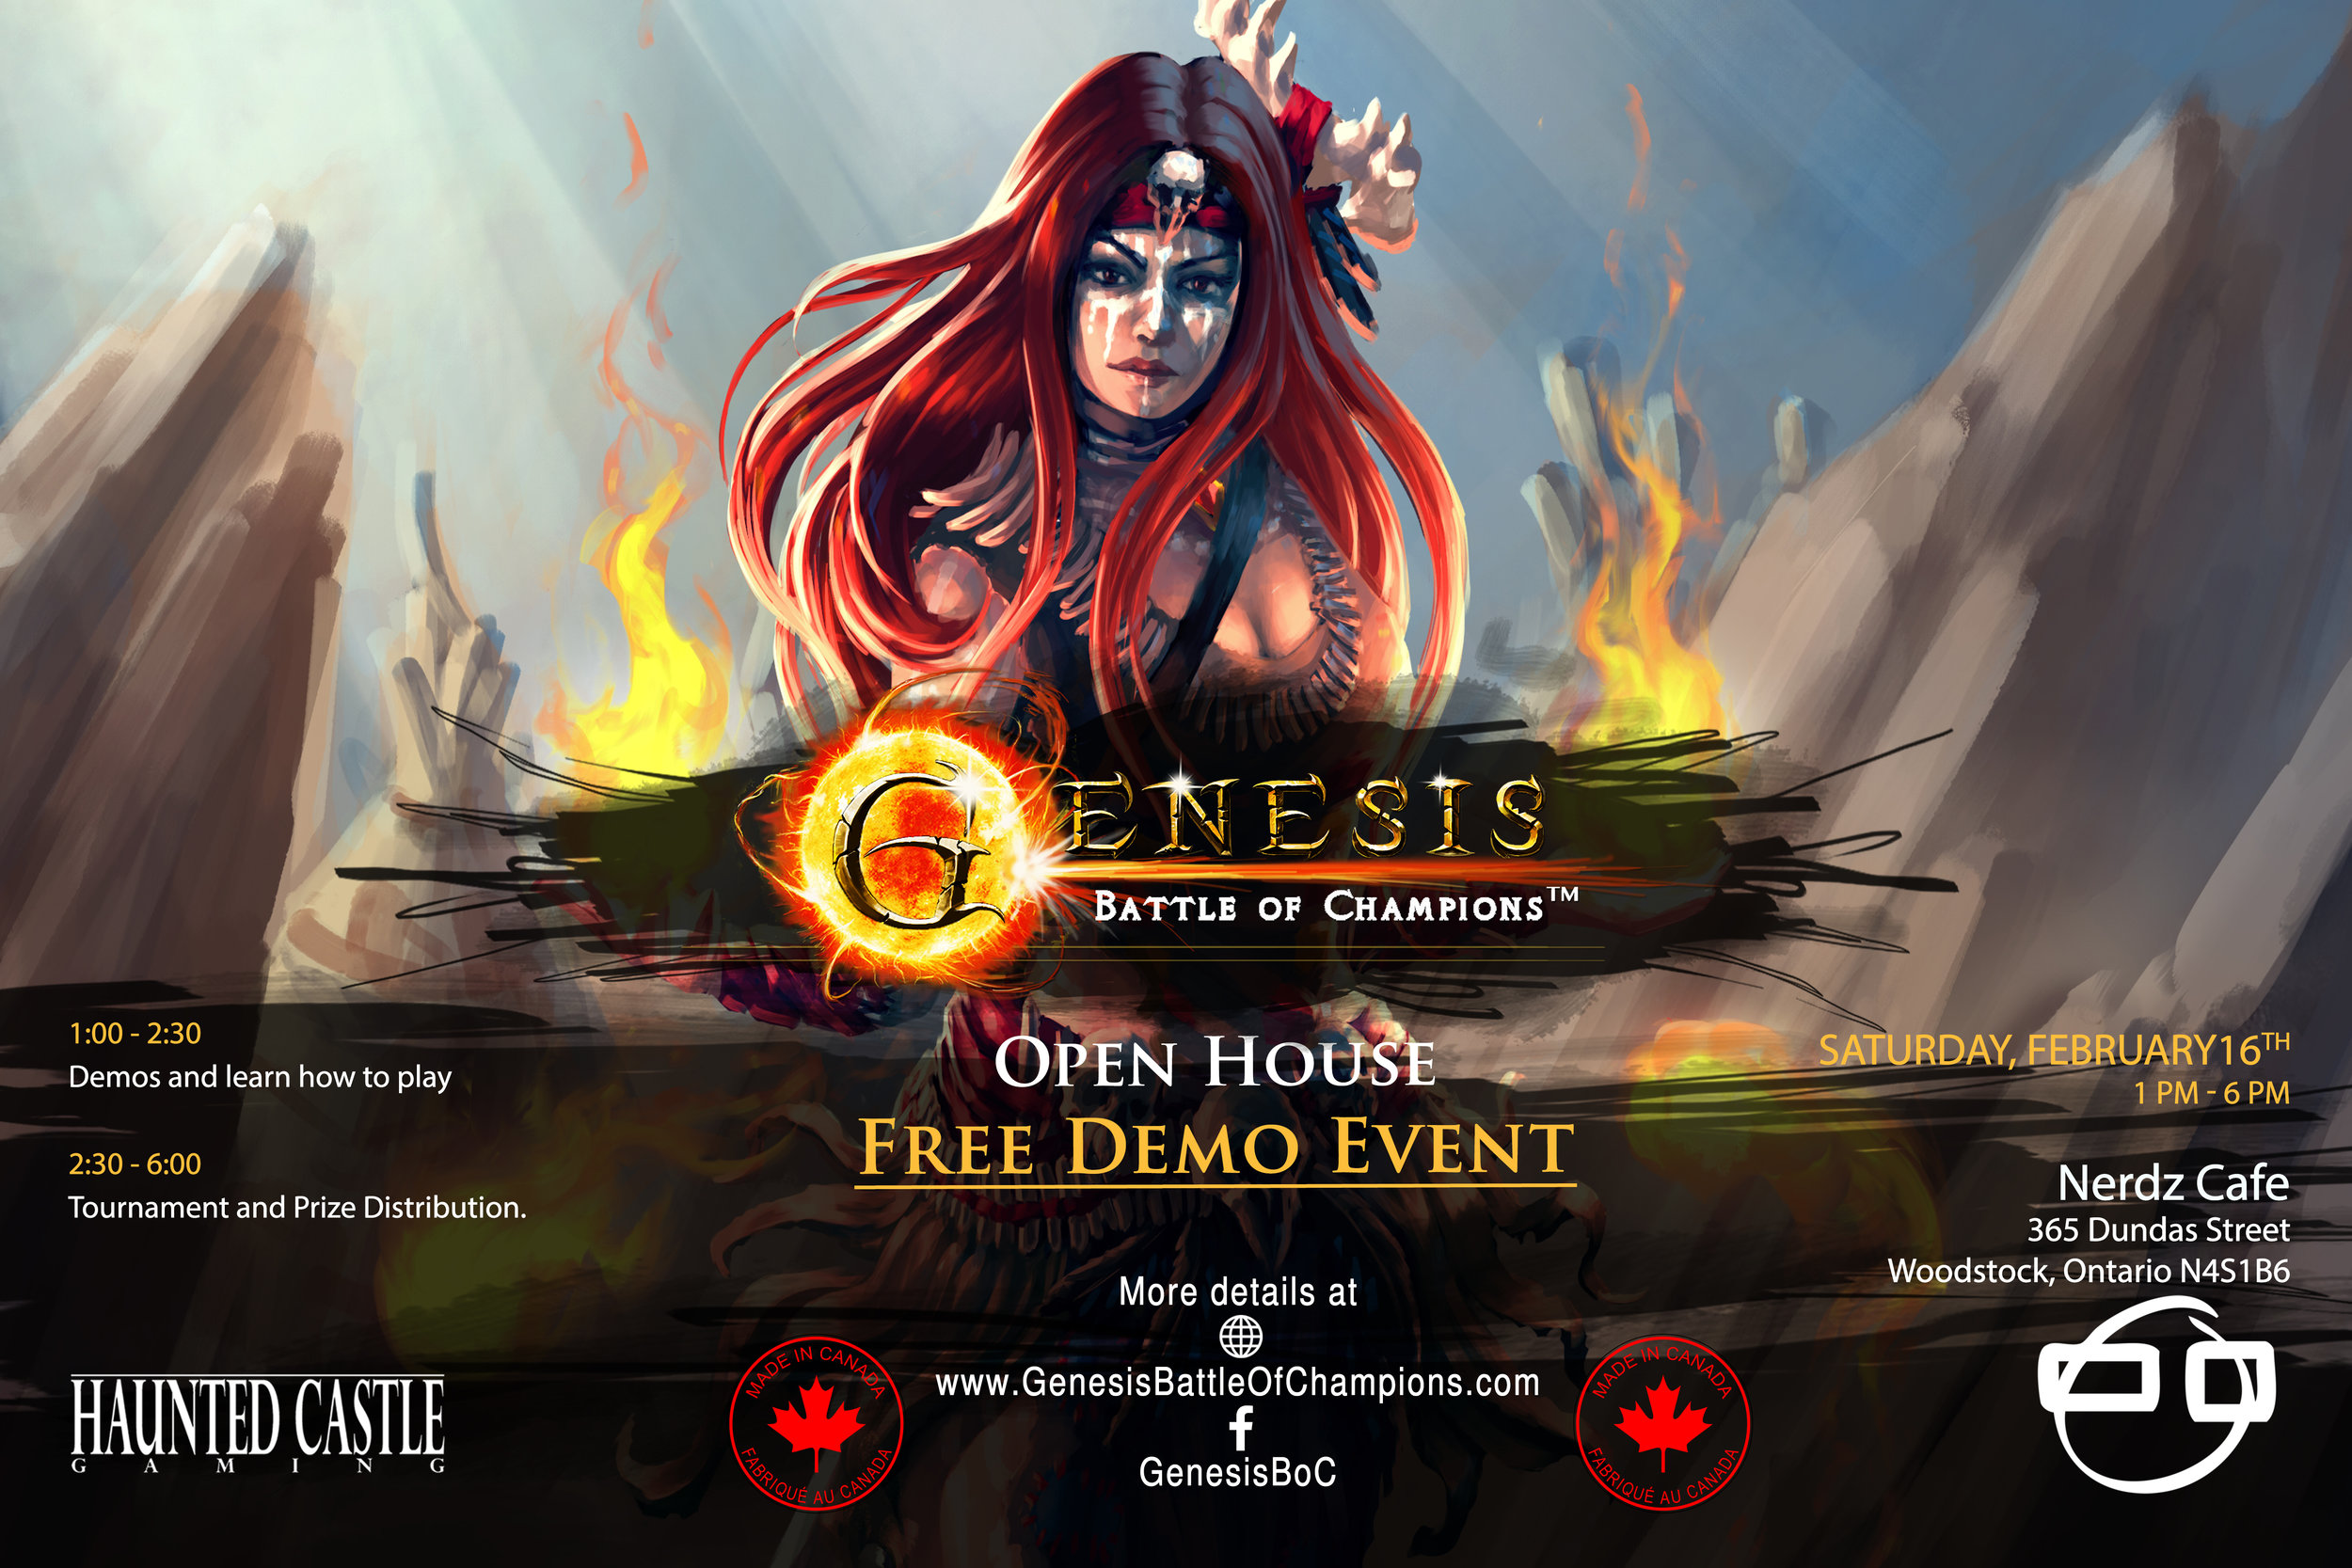 Nerdz Cafe - Demo Event Poster.jpg